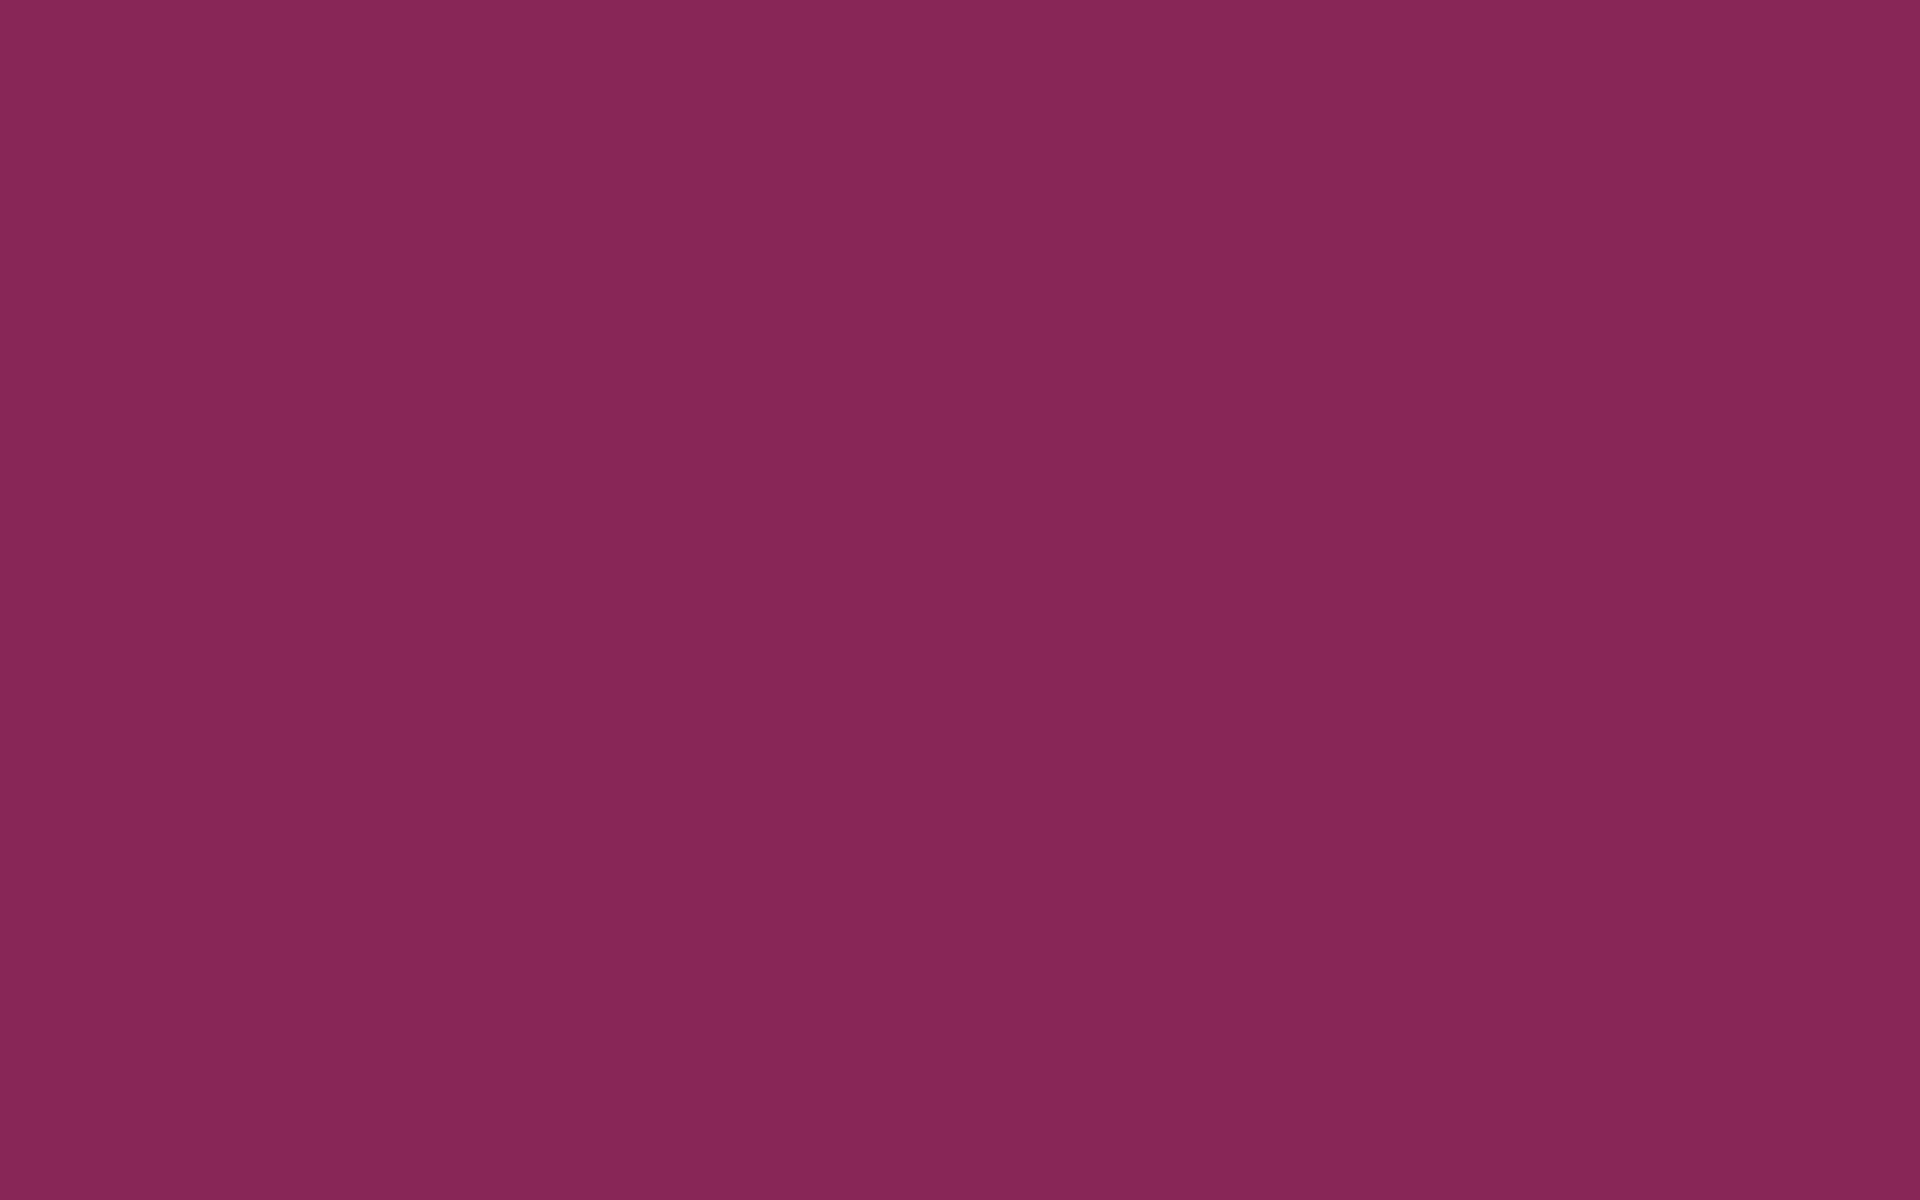 1920x1200 Dark Raspberry Solid Color Background